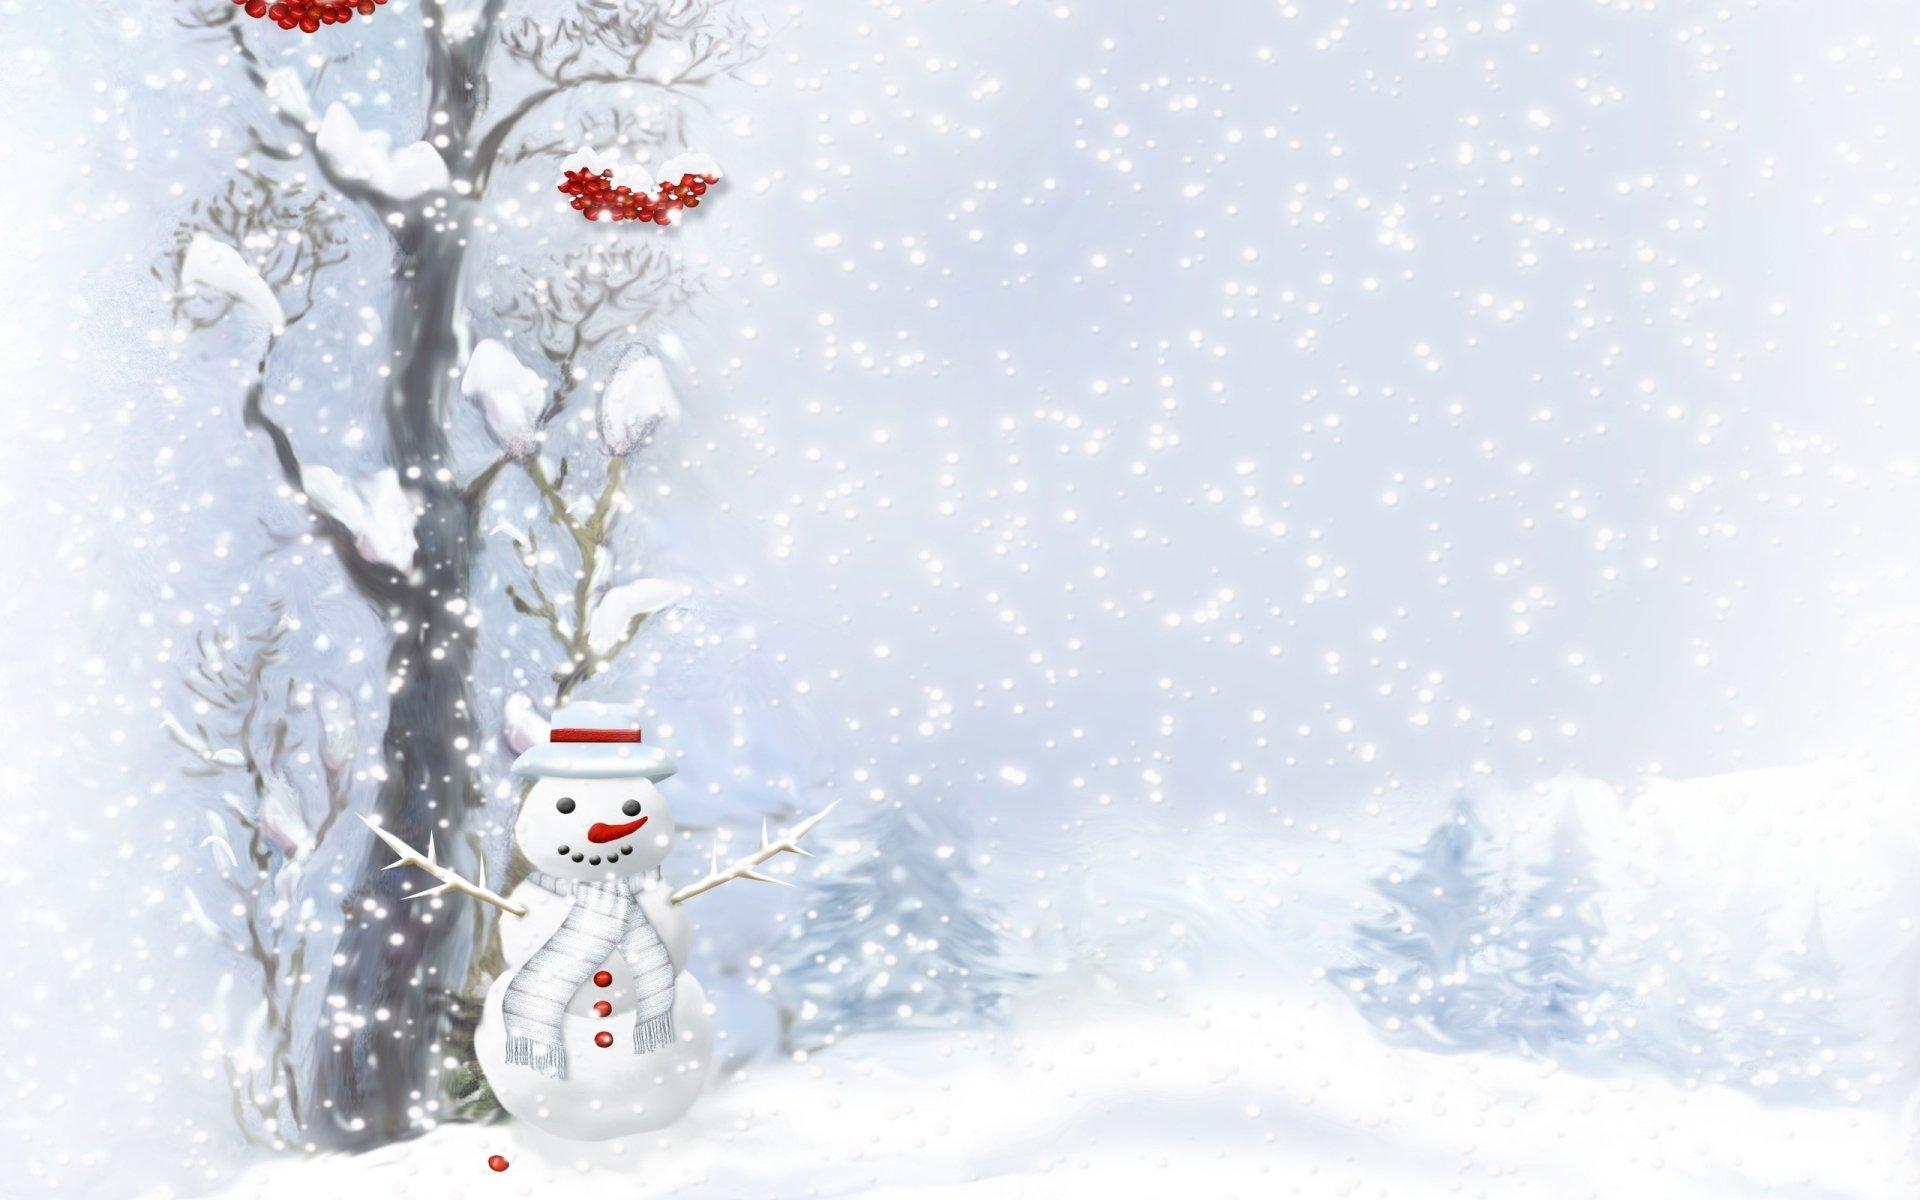 Artistic - Snowman  Wallpaper